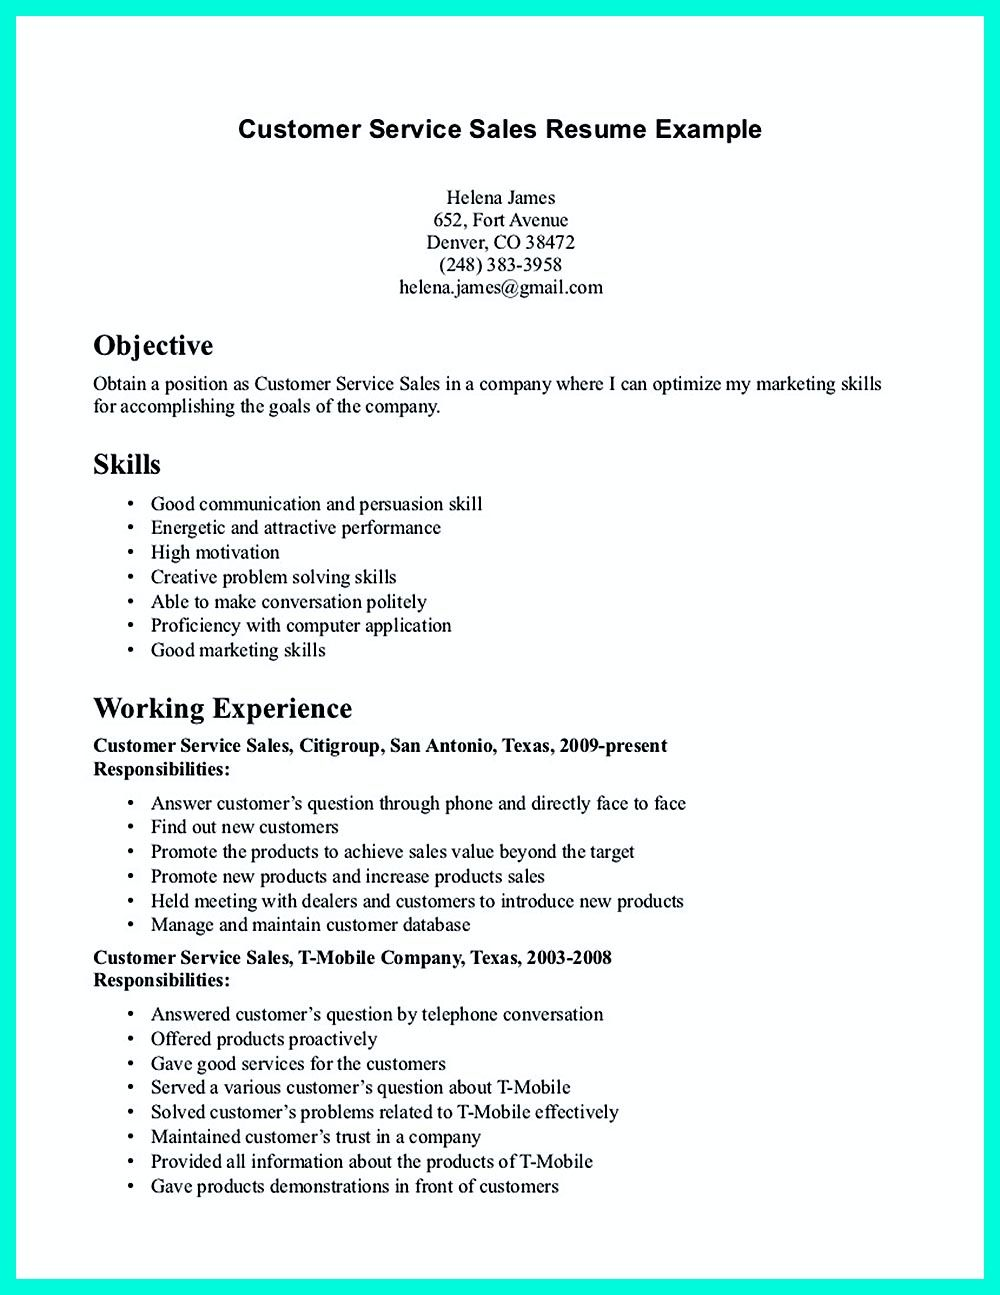 CSR resume or Customer Service Representative resume